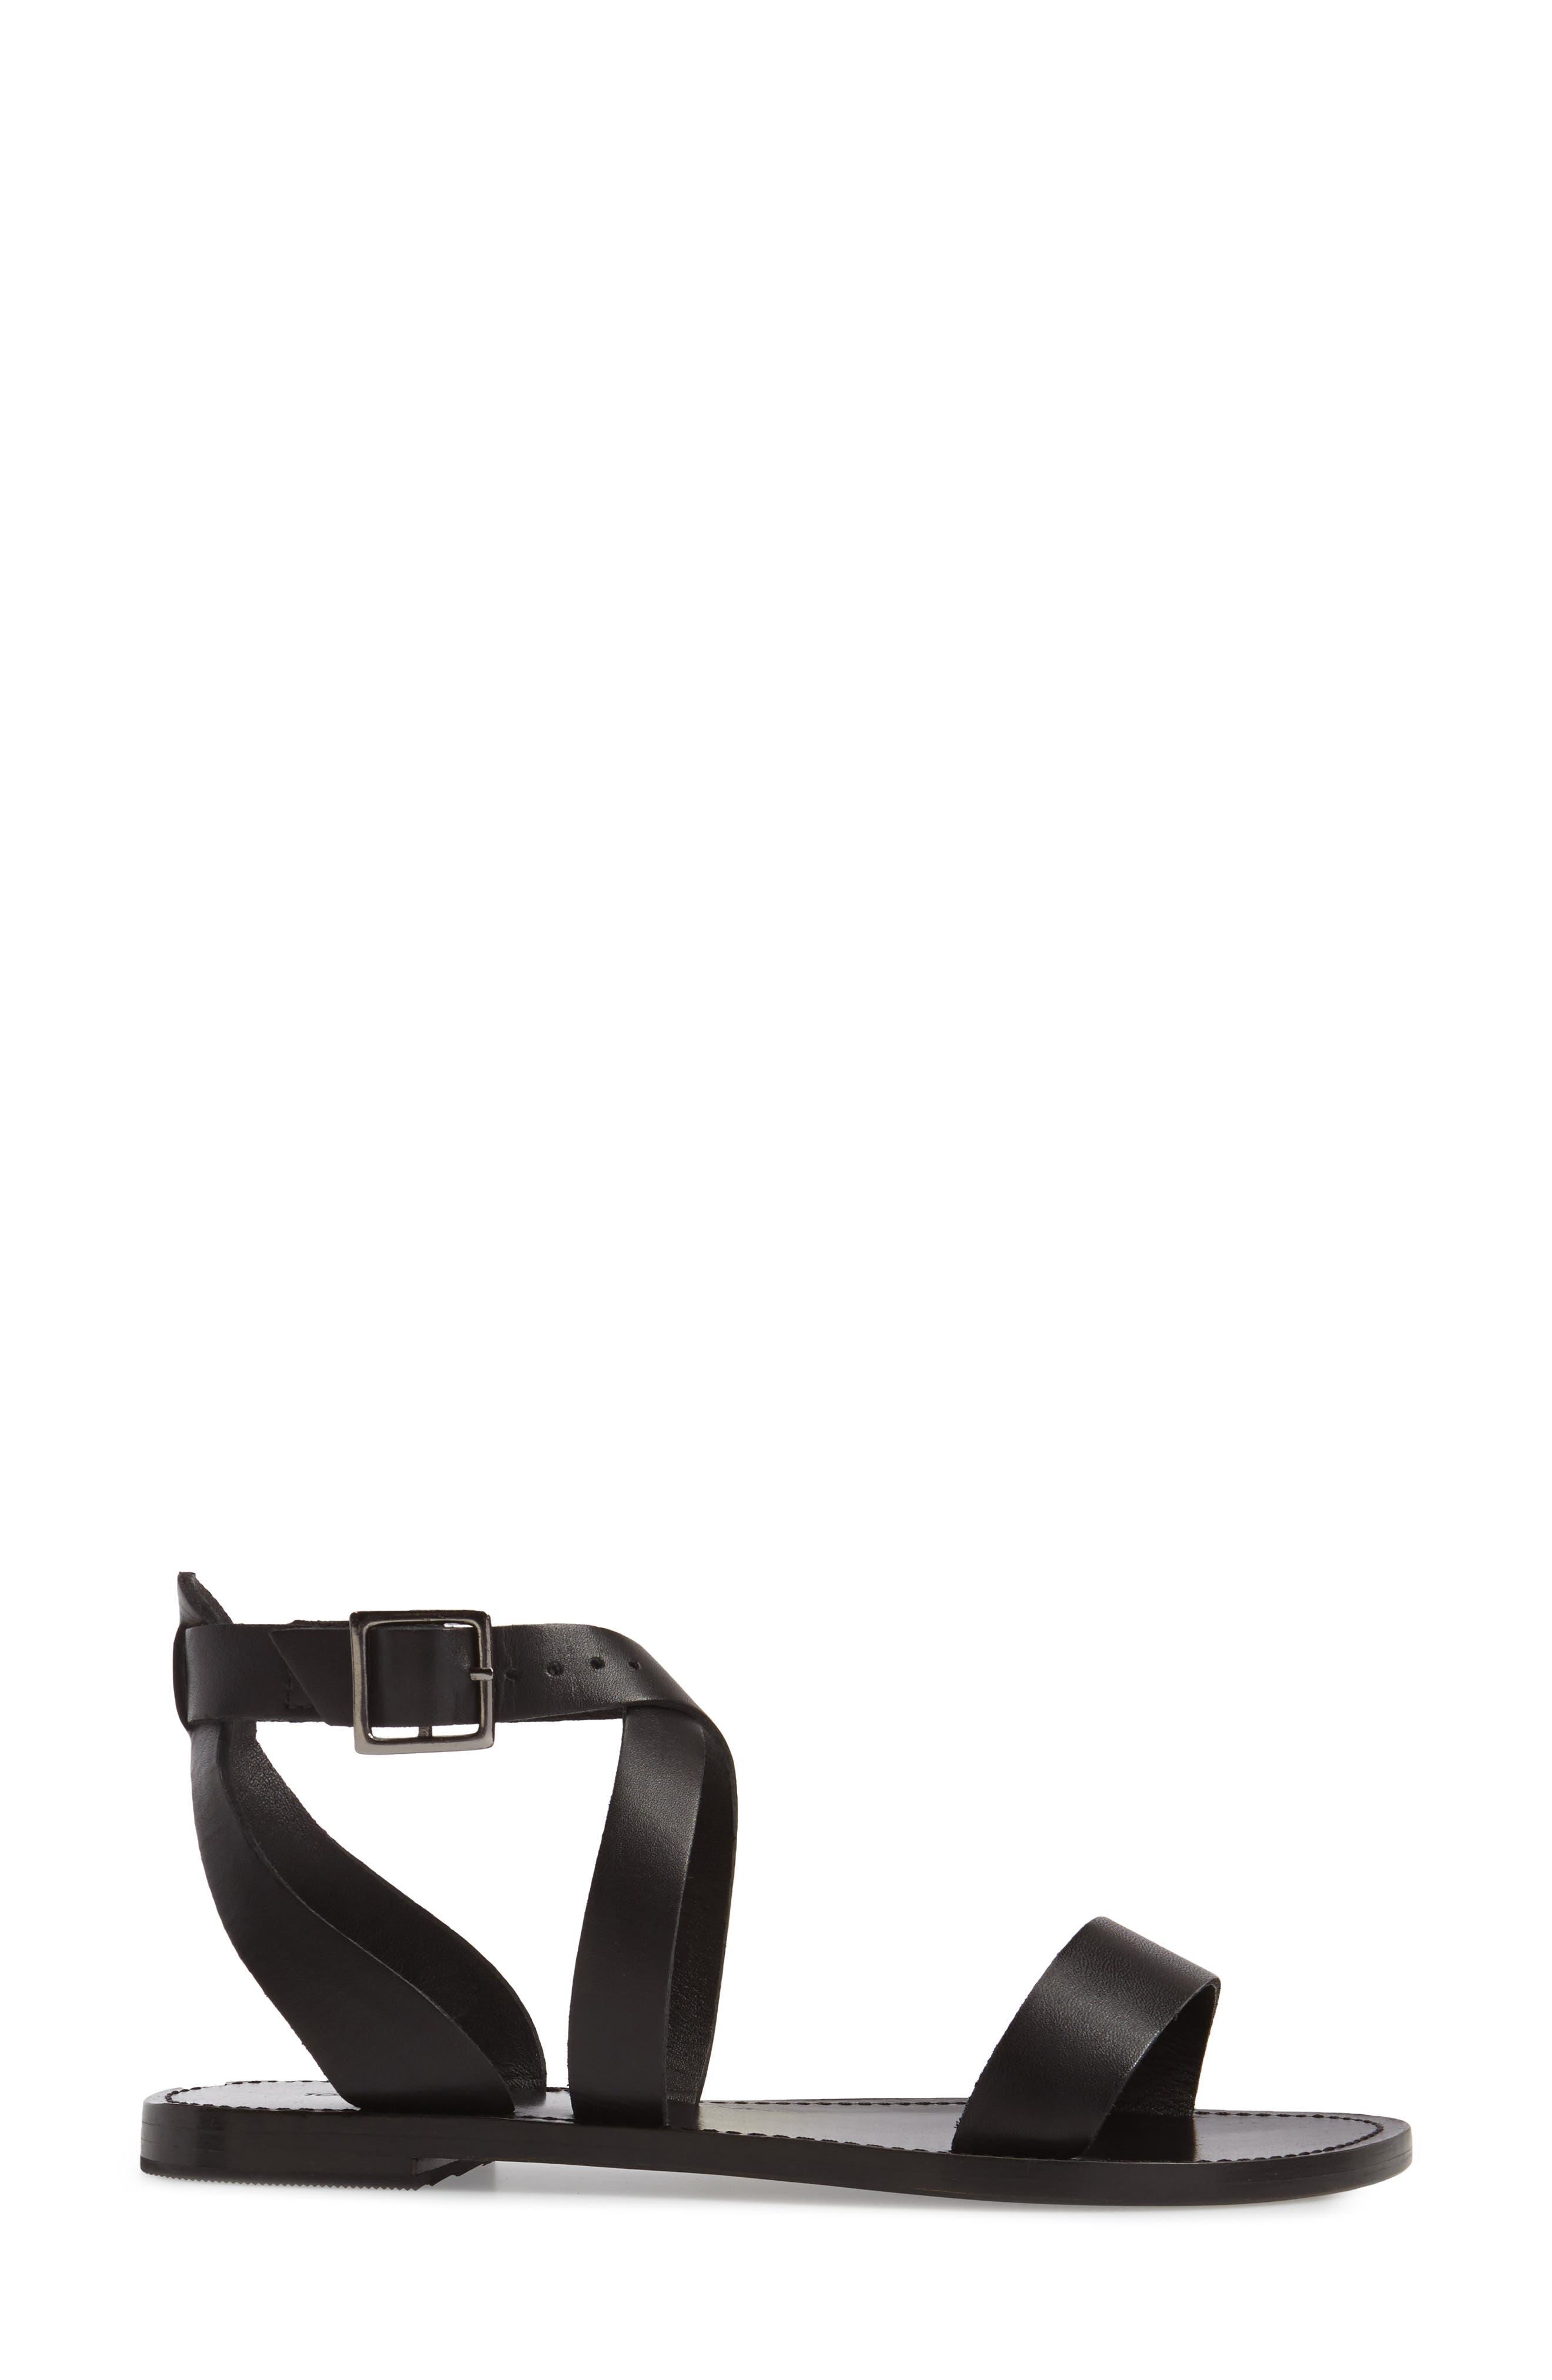 Alternate Image 3  - Tony Bianco Flo Ankle Strap Sandal (Women)